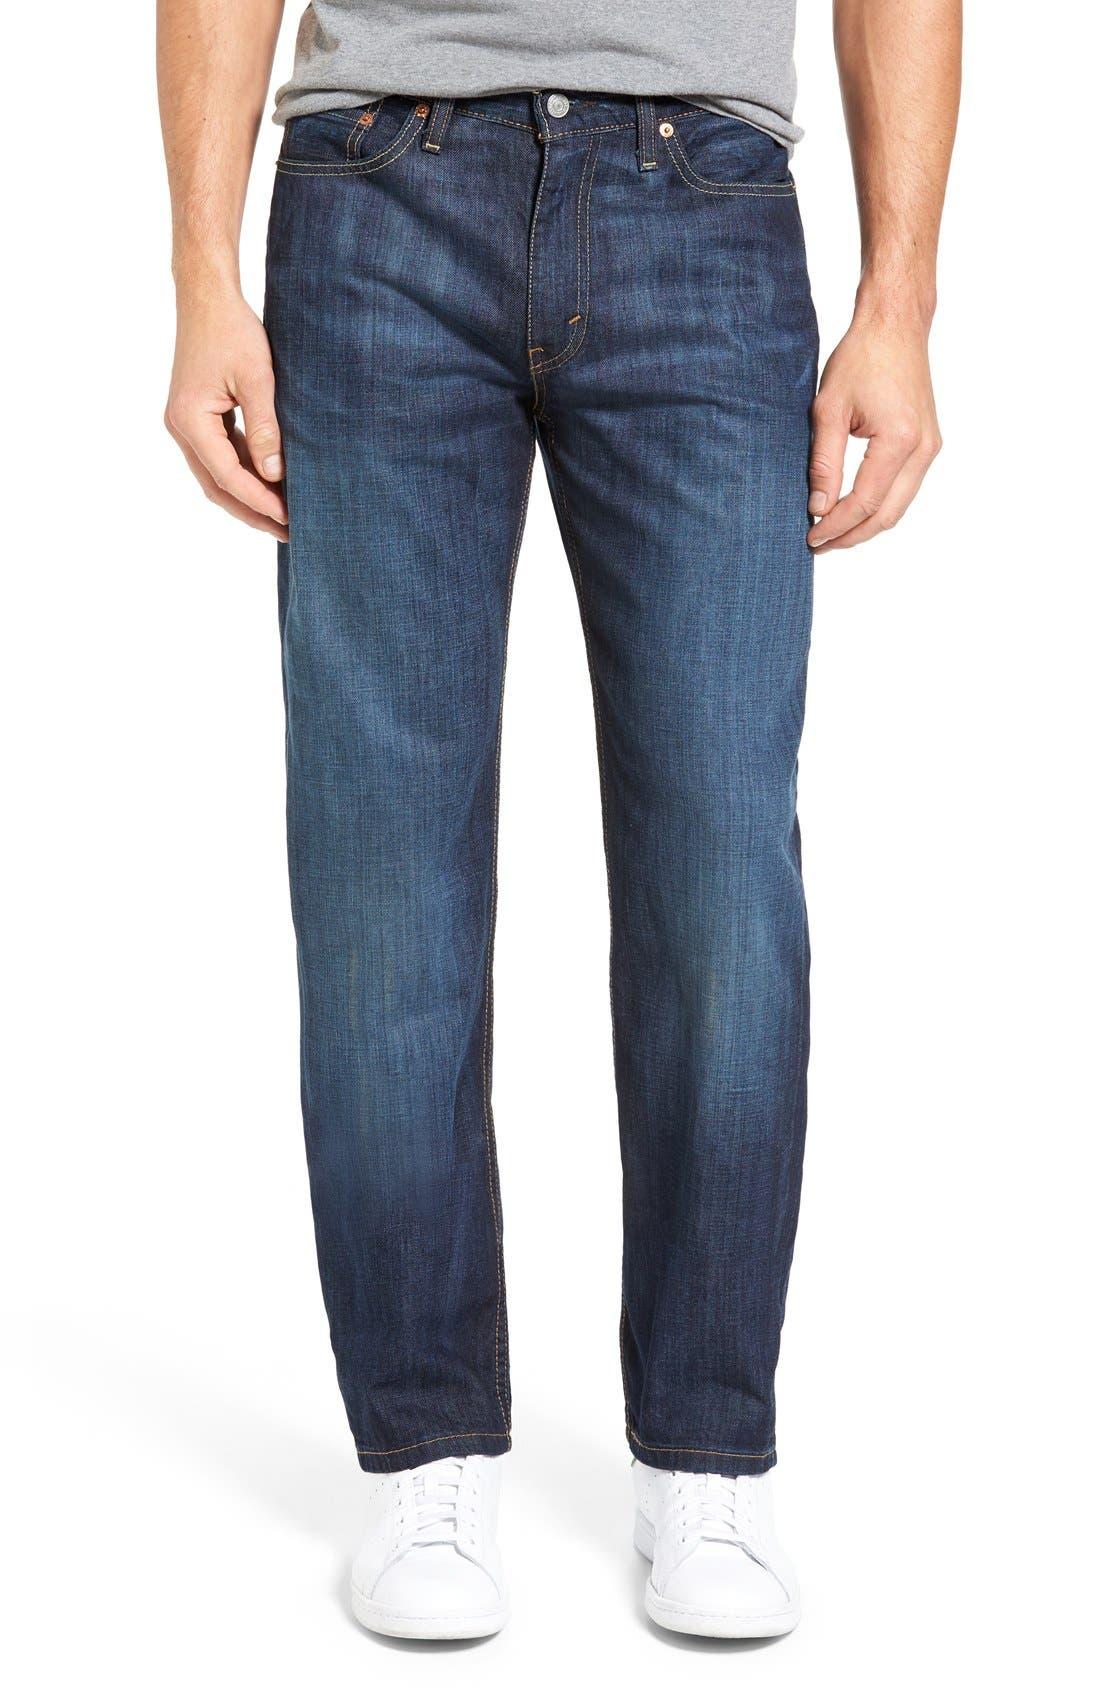 Alternate Image 1 Selected - Levi's® 514™ Straight Leg Jeans